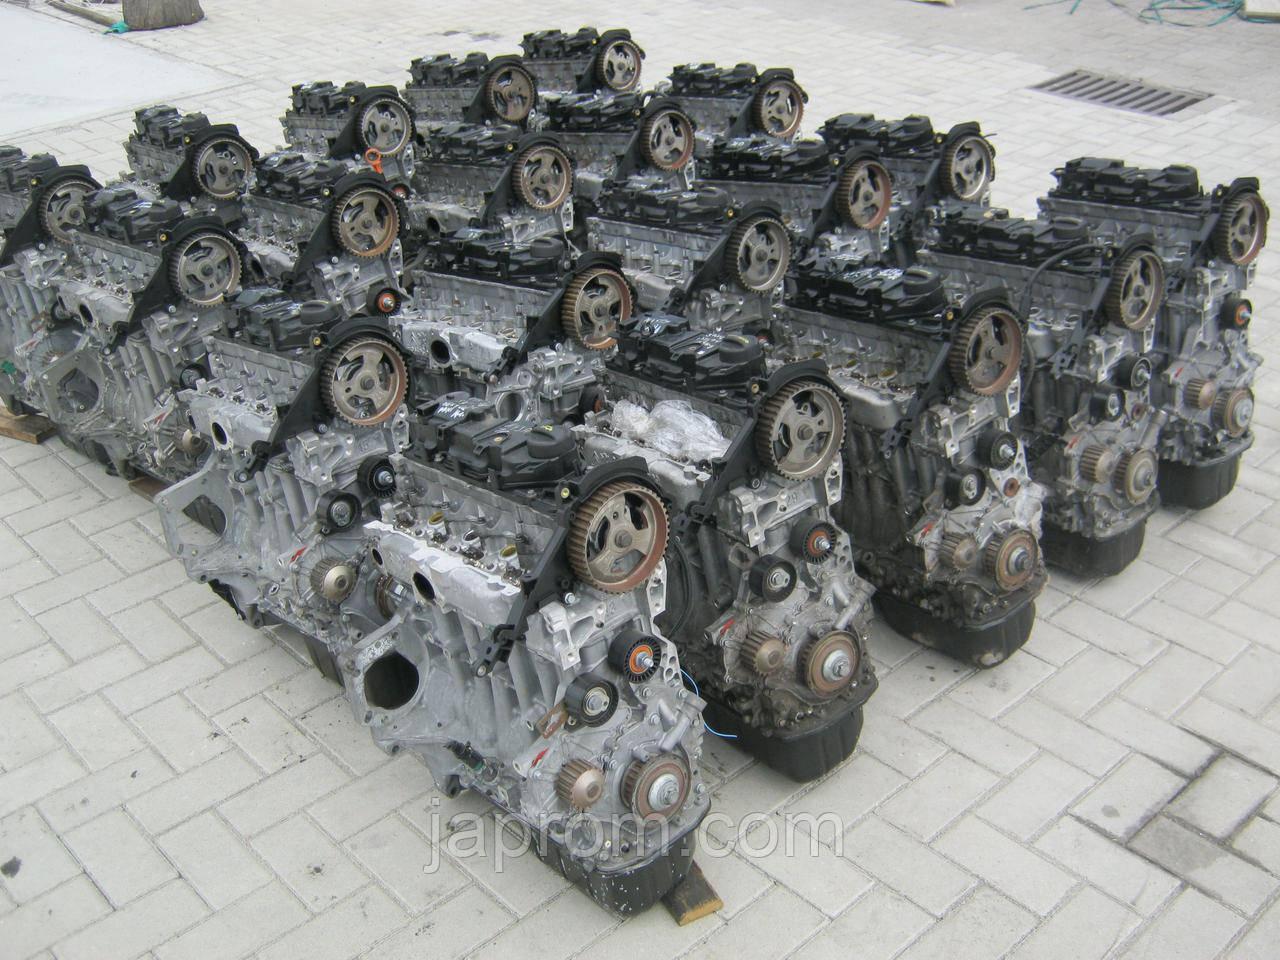 Мотор (Двигатель) Citroena C1, C2,C3 ,Nemo,Peugeota 107, 208 ,Bipper 1.4 HDI 2012-2015г.в.